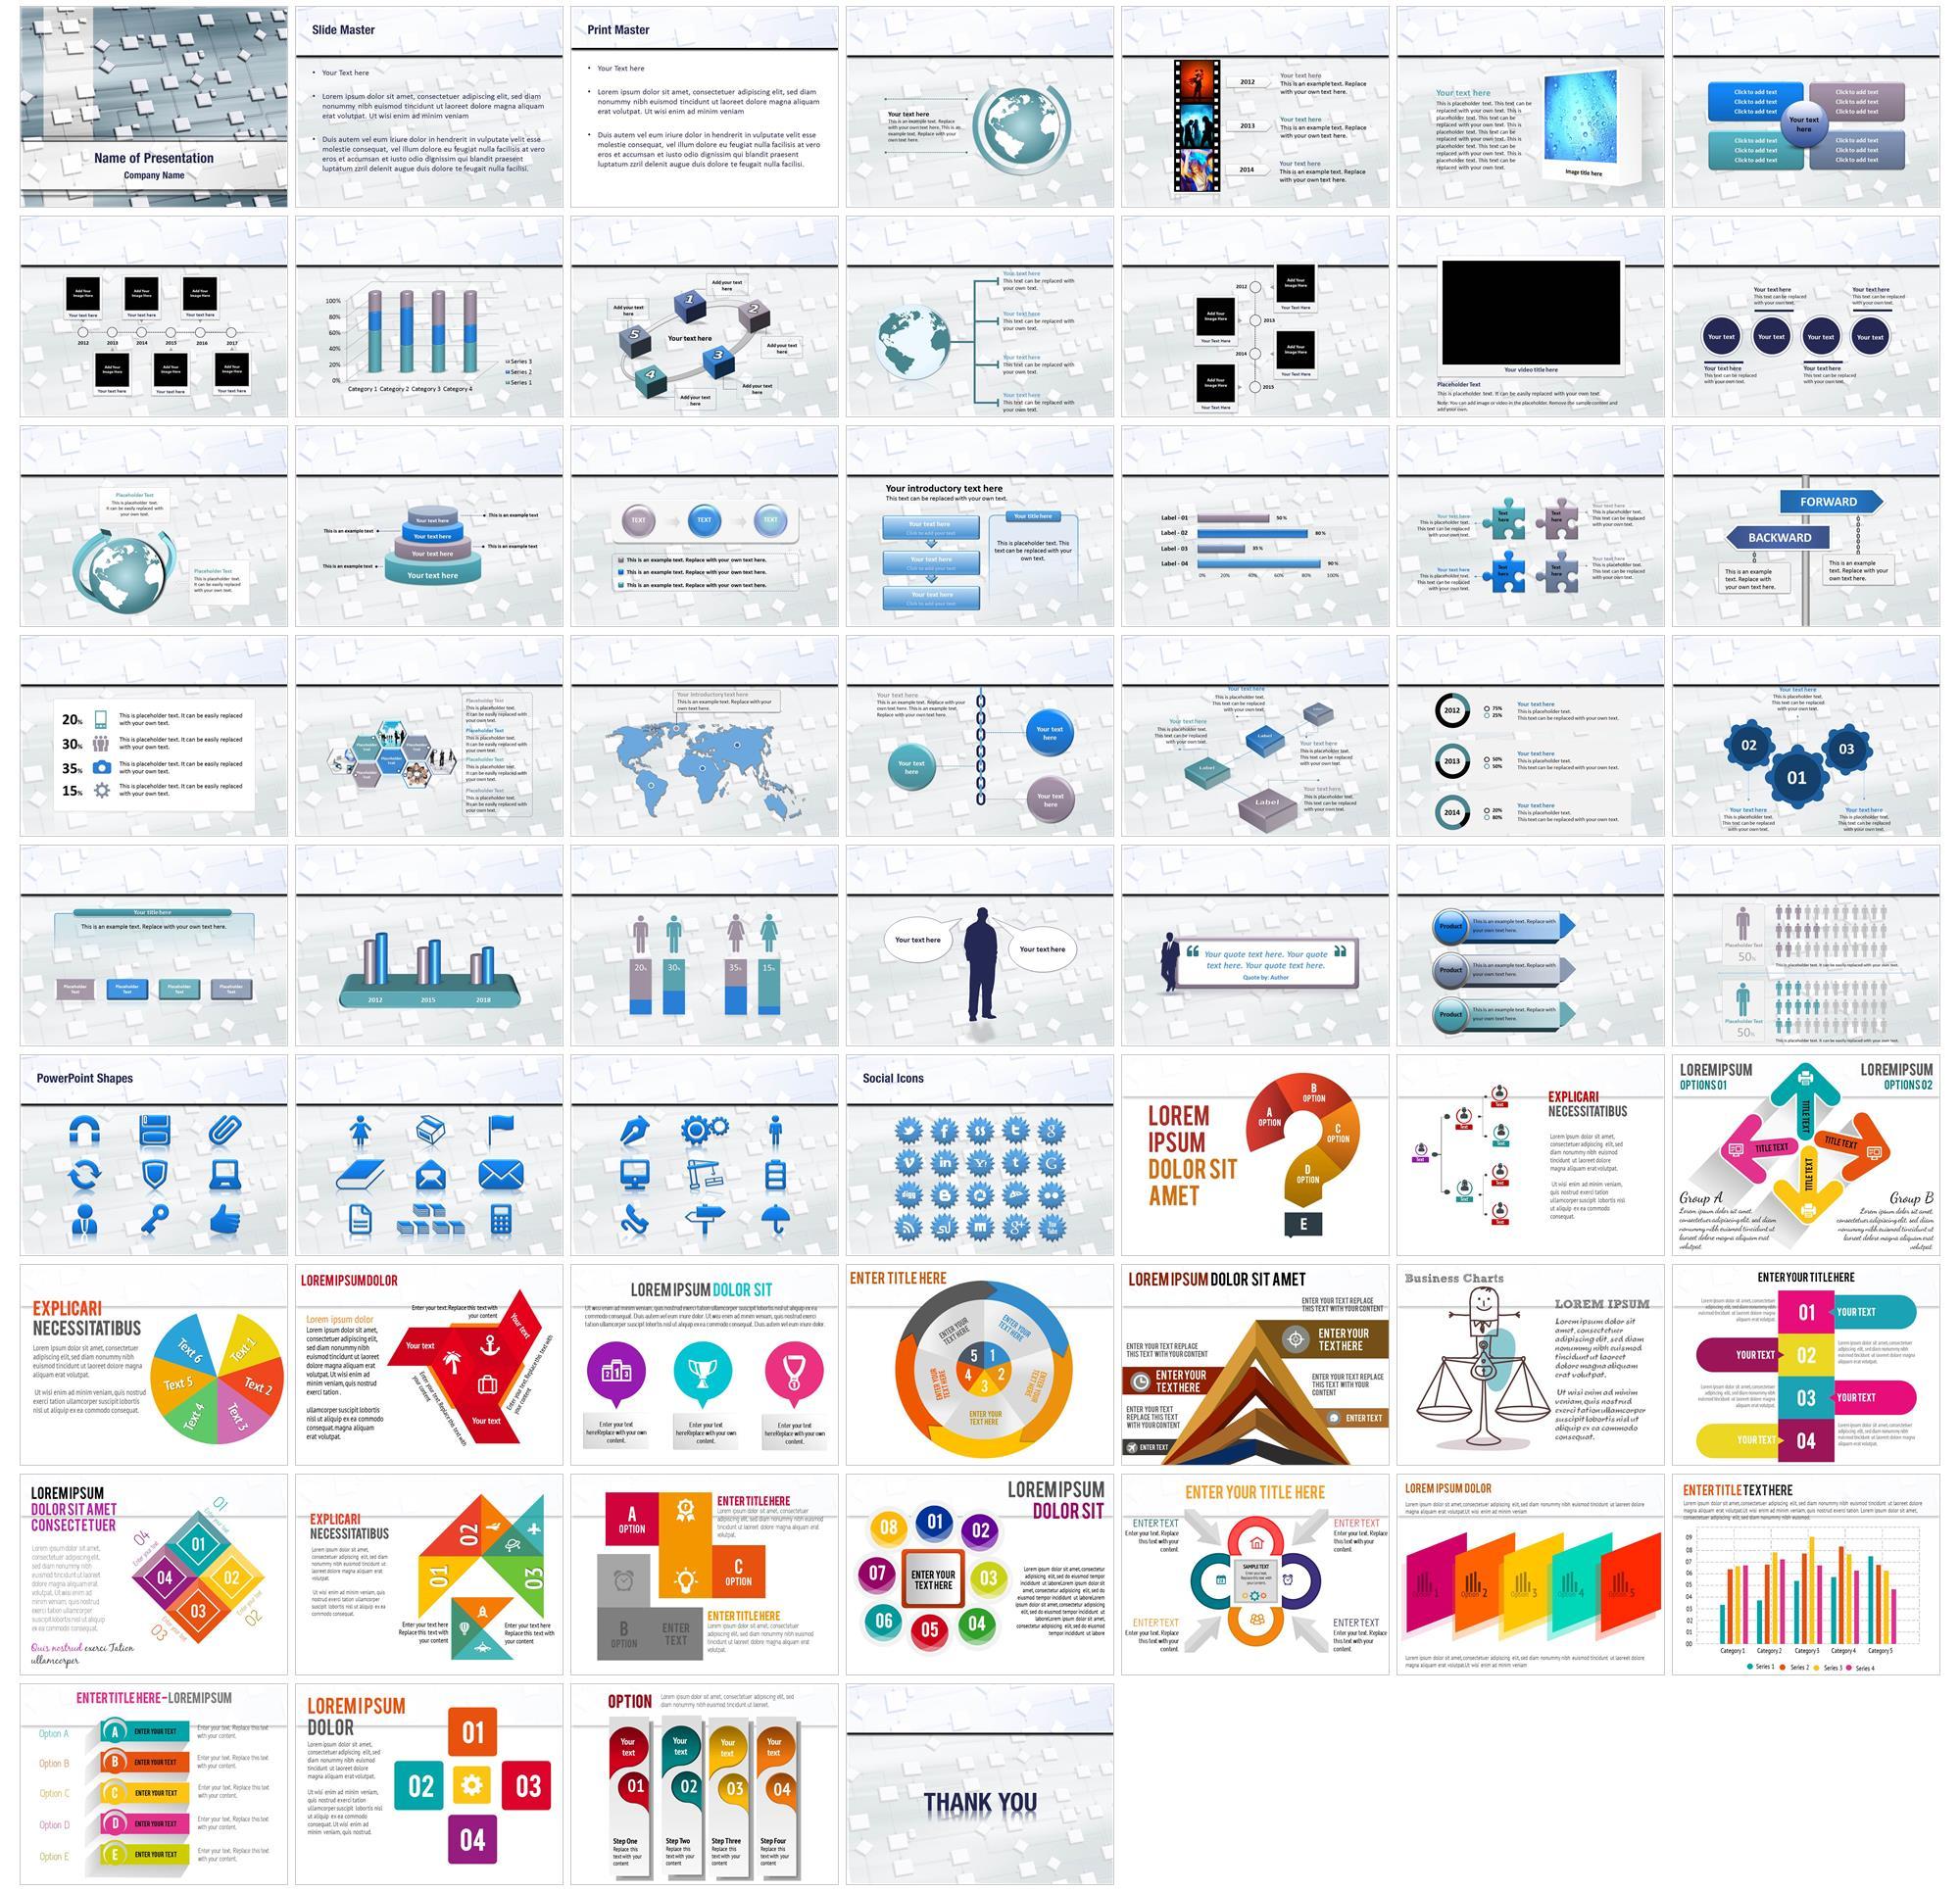 Logic Diagram Large Preview. Web Services Large Preview